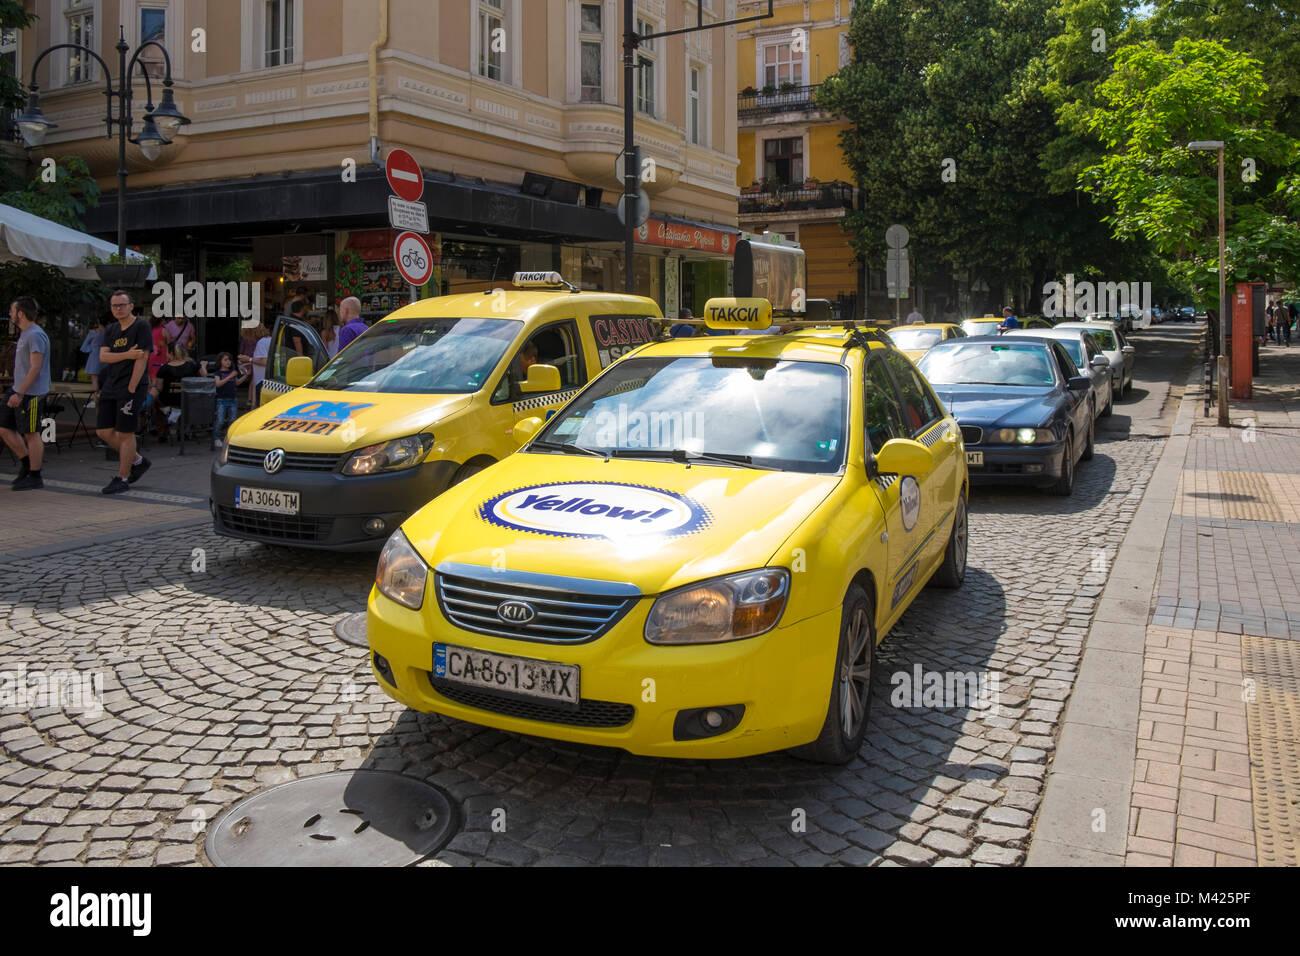 Taxis on Vitosha Boulevard, Sofia city centre, Bulgaria, Europe - Stock Image